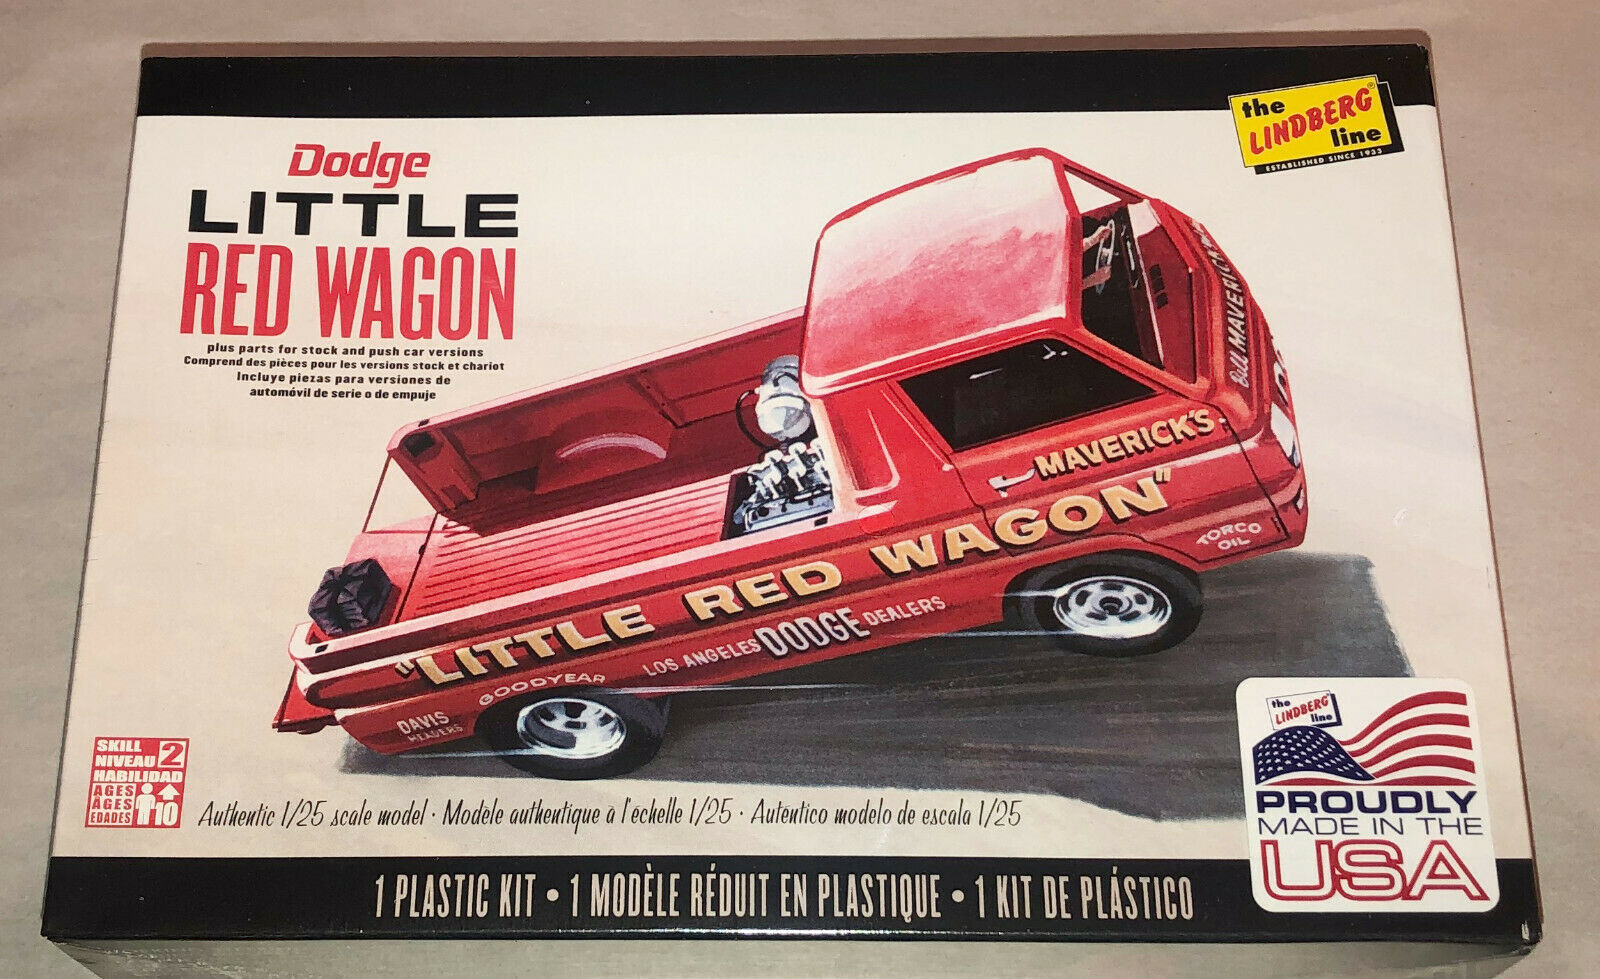 Lindberg Little Red Wagon Drag Racing Team 1 25 Model Car Mountain Fs For Sale Online Ebay